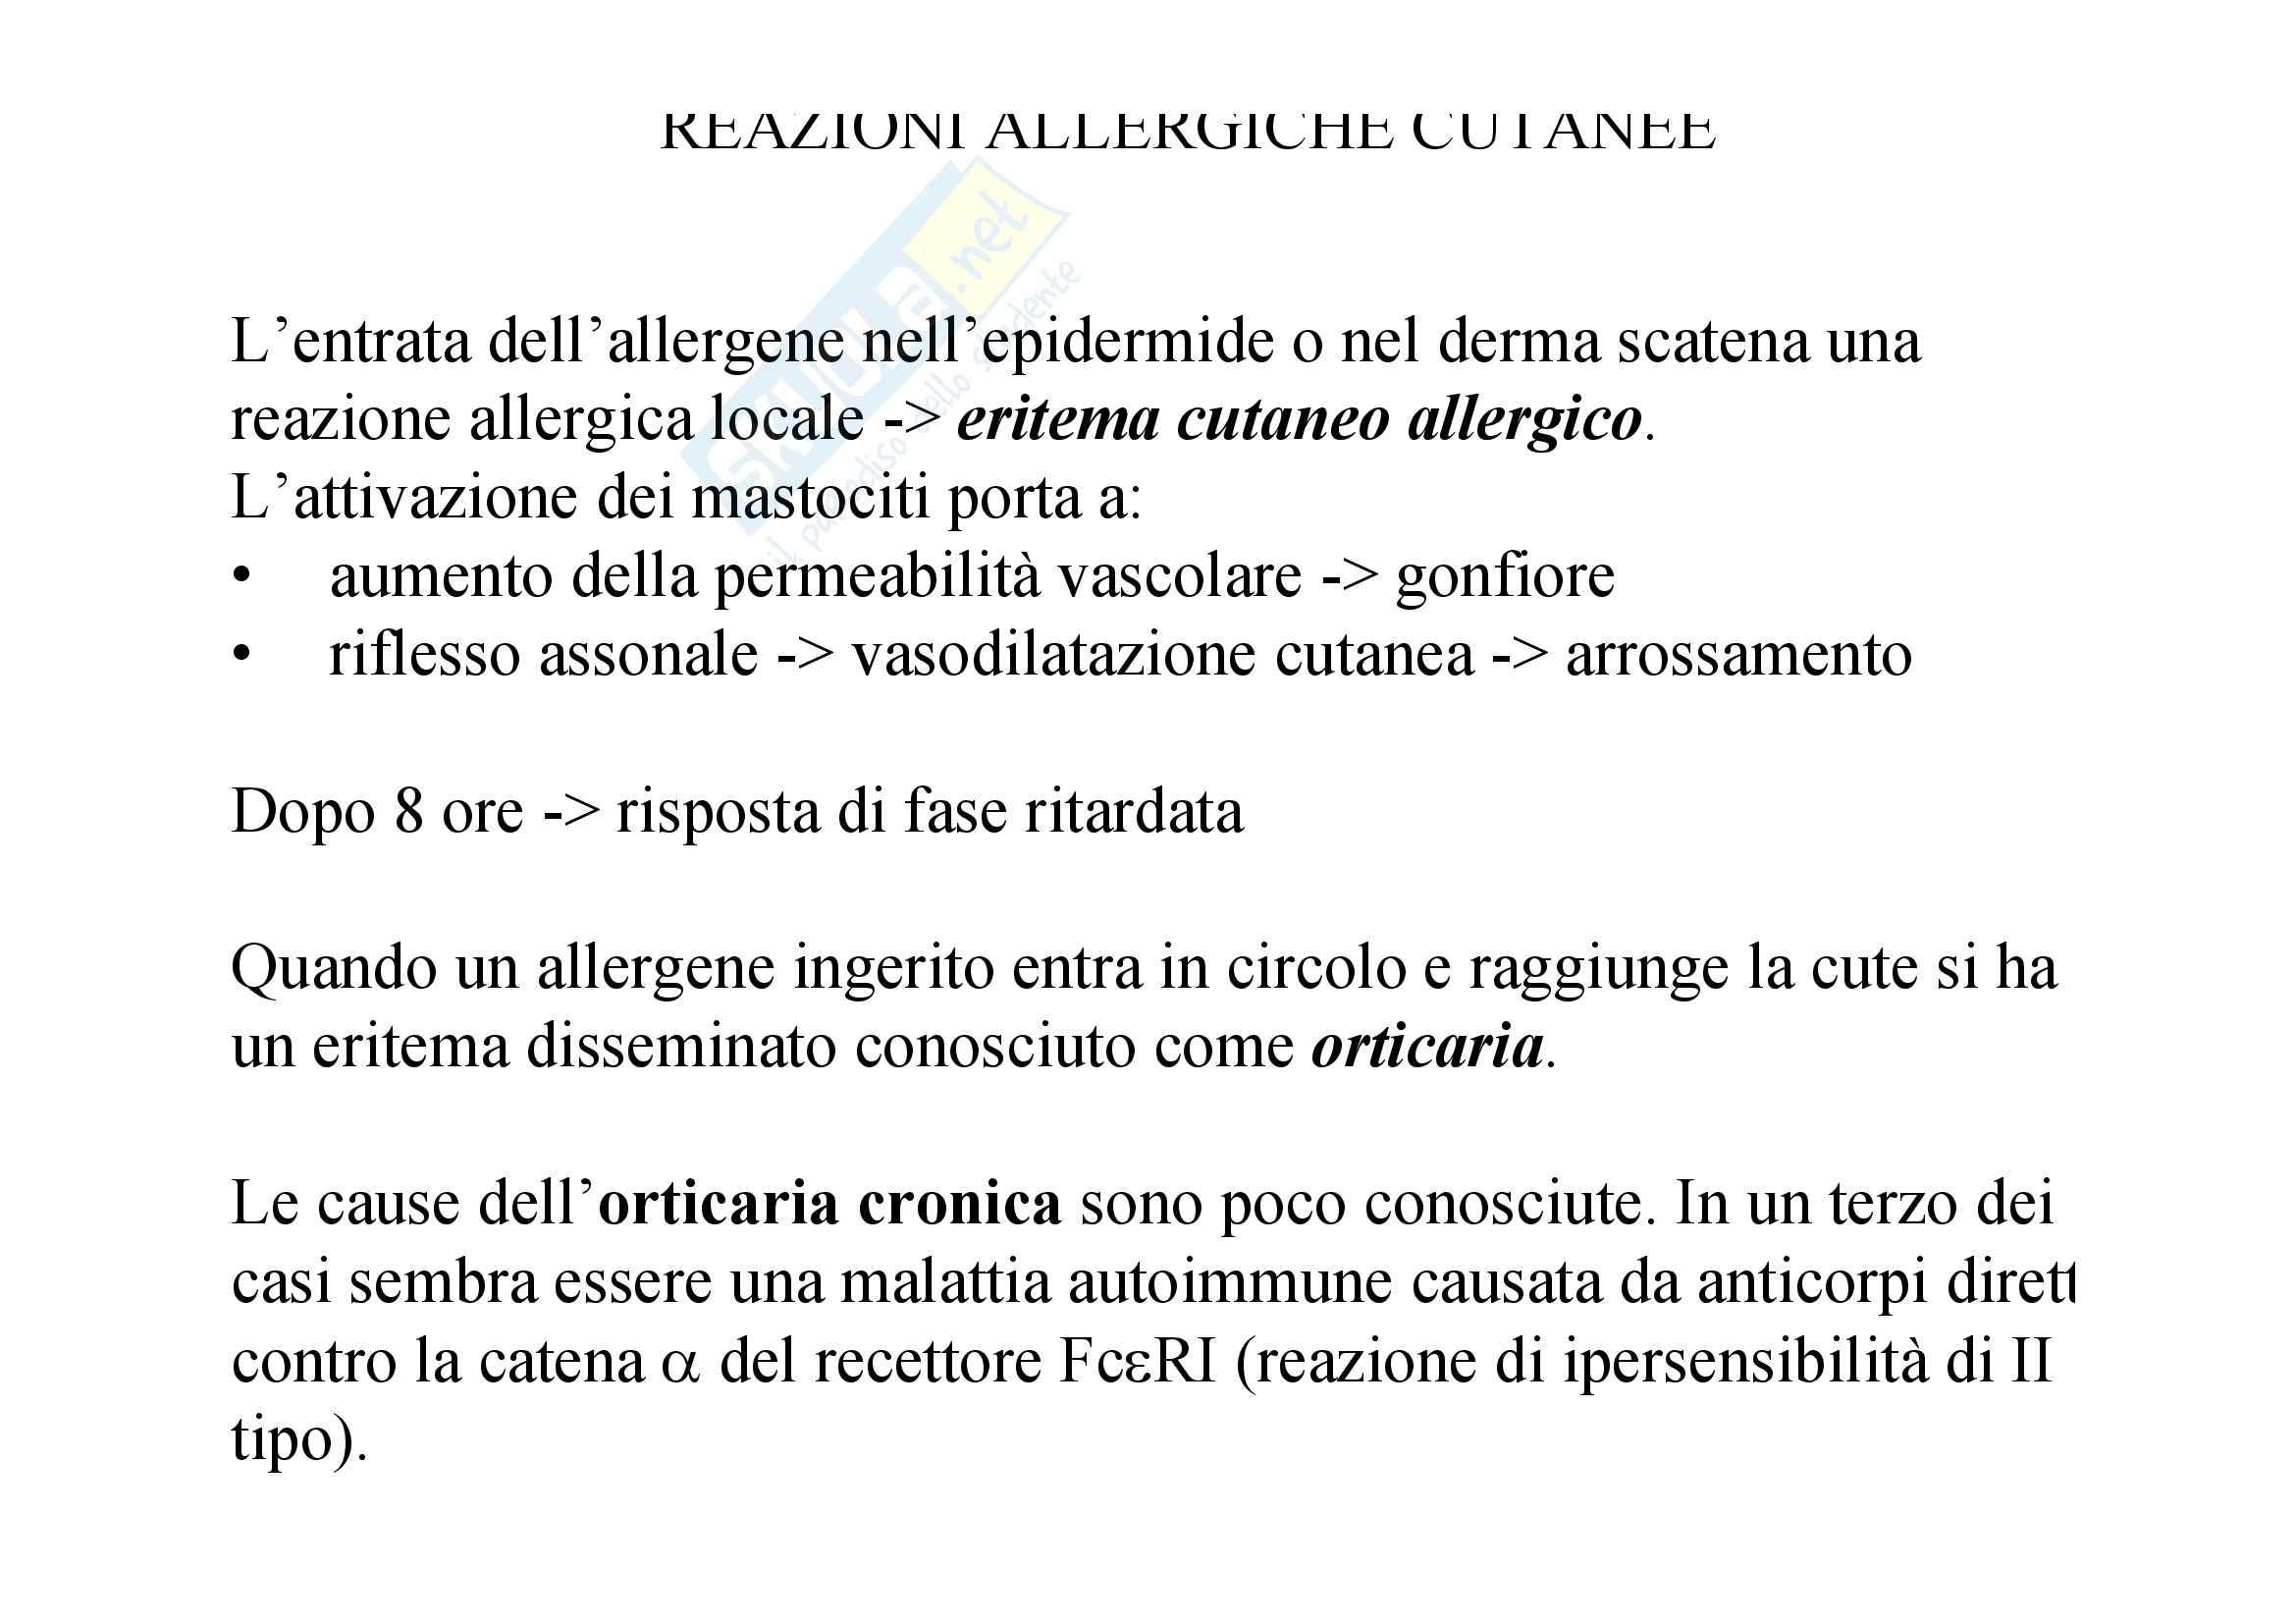 Immunologia - allergie cutanee